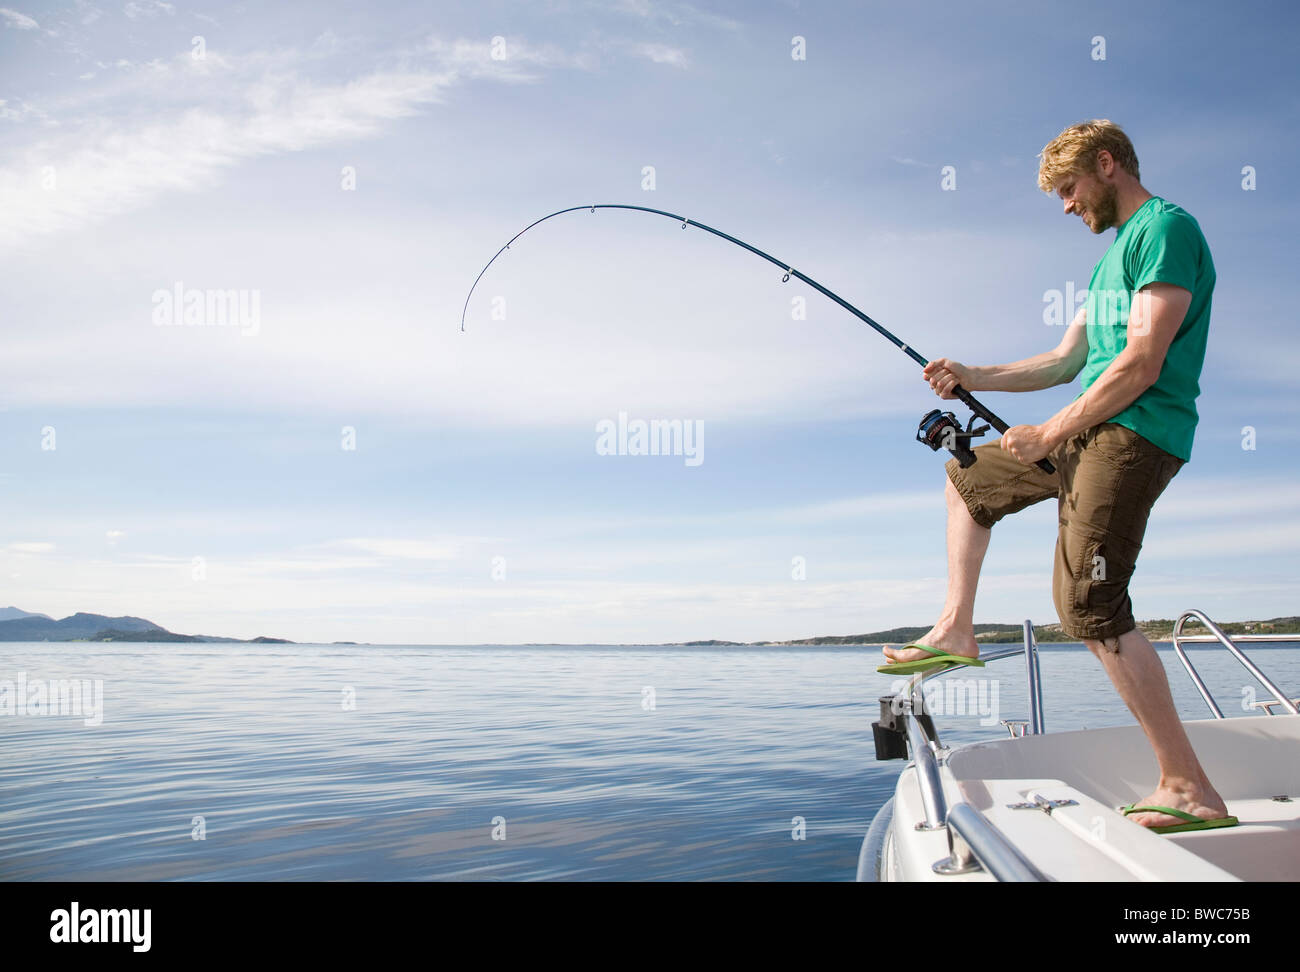 Man deep-sea fishing from boat - Stock Image